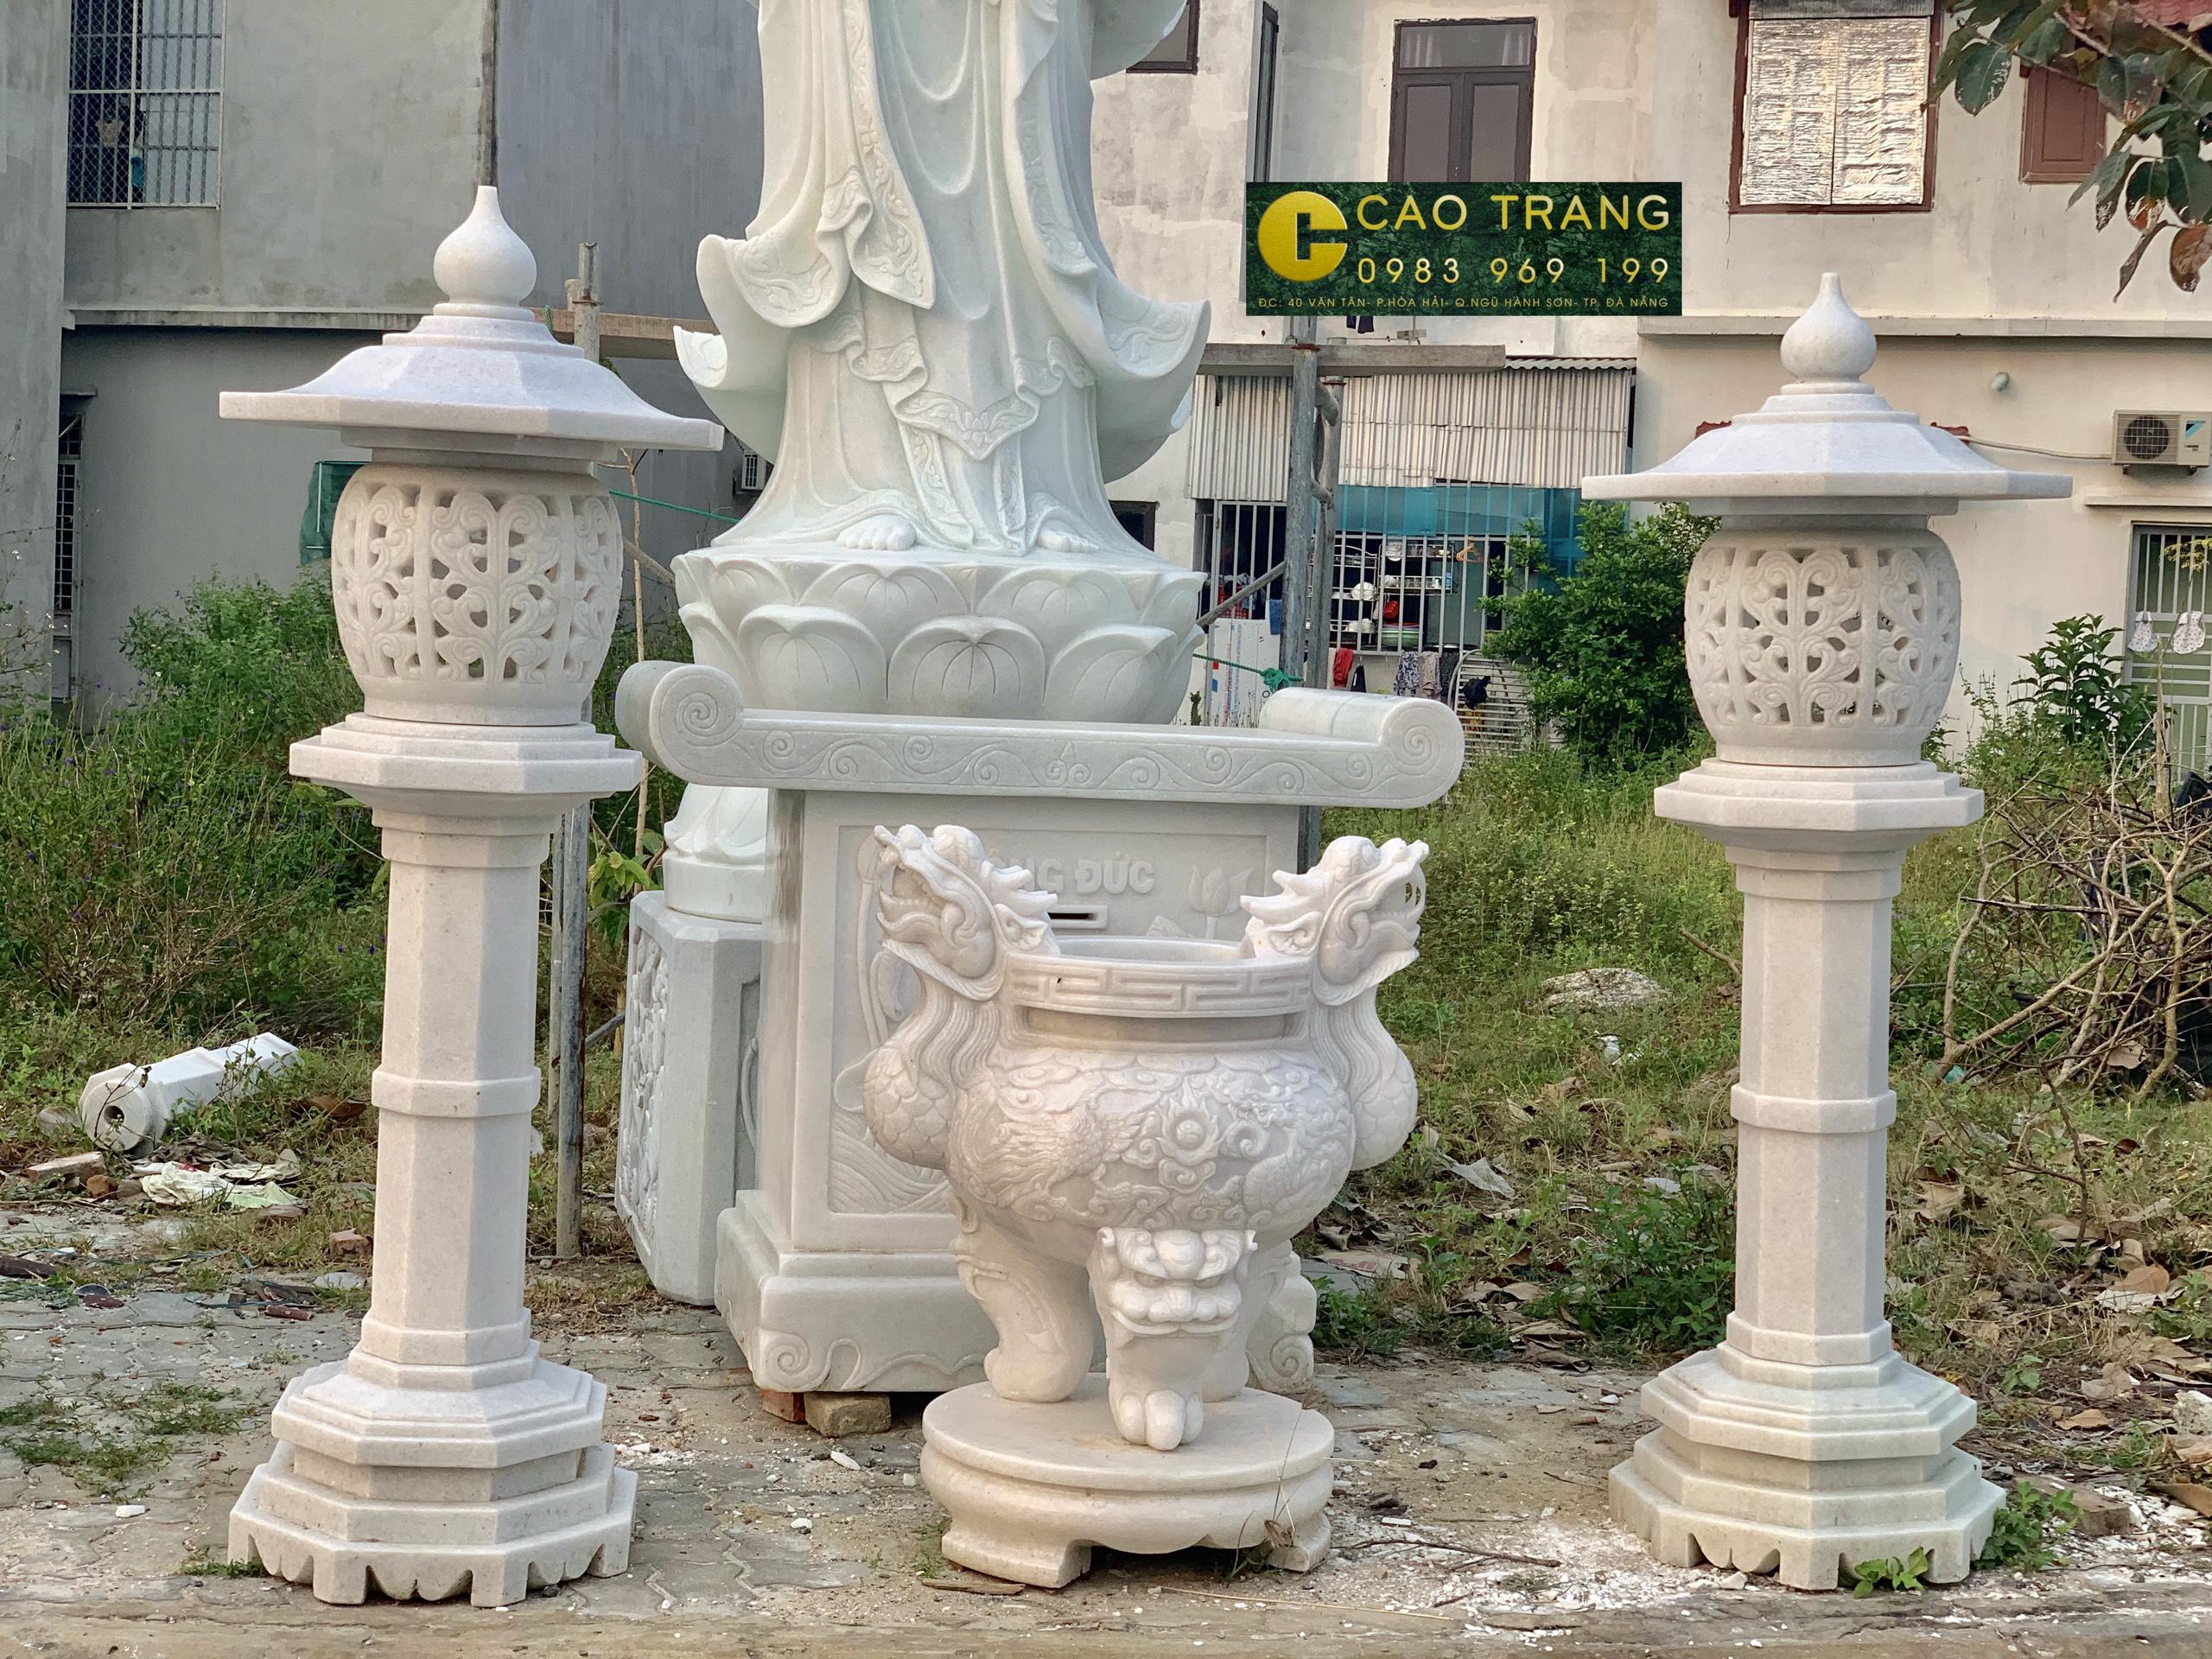 lu-huong-den-thung-cong-duc